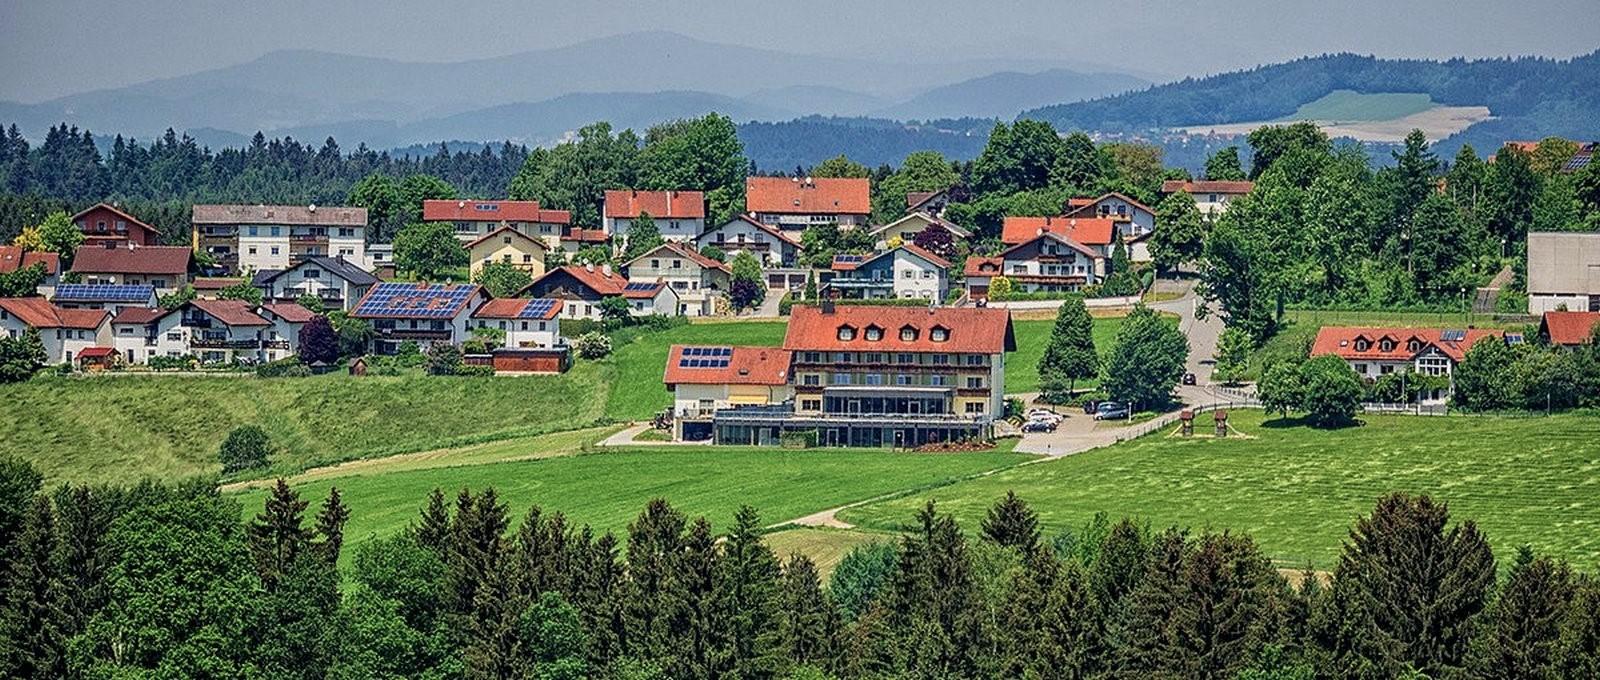 Wellness und Balancehotel Landrefugium Obermüller